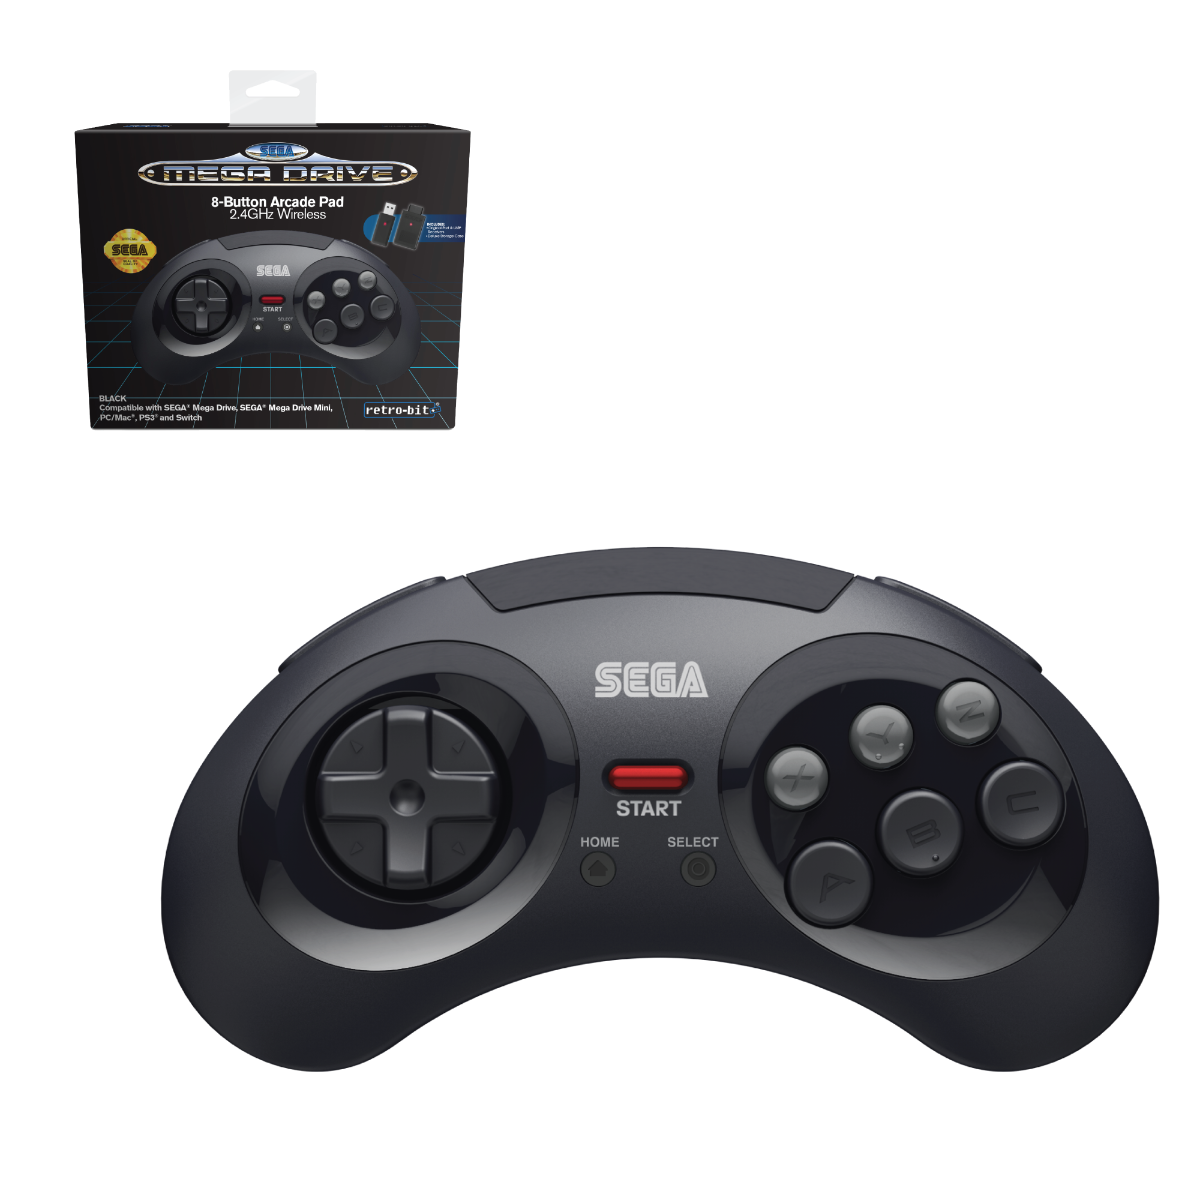 SEGA, Mega Drive, 2.4 GHz Wireless, 8-Button, Arcade Pad, Controller, USB, PC, Mac, PS3, Switch, Genesis Mini, Black